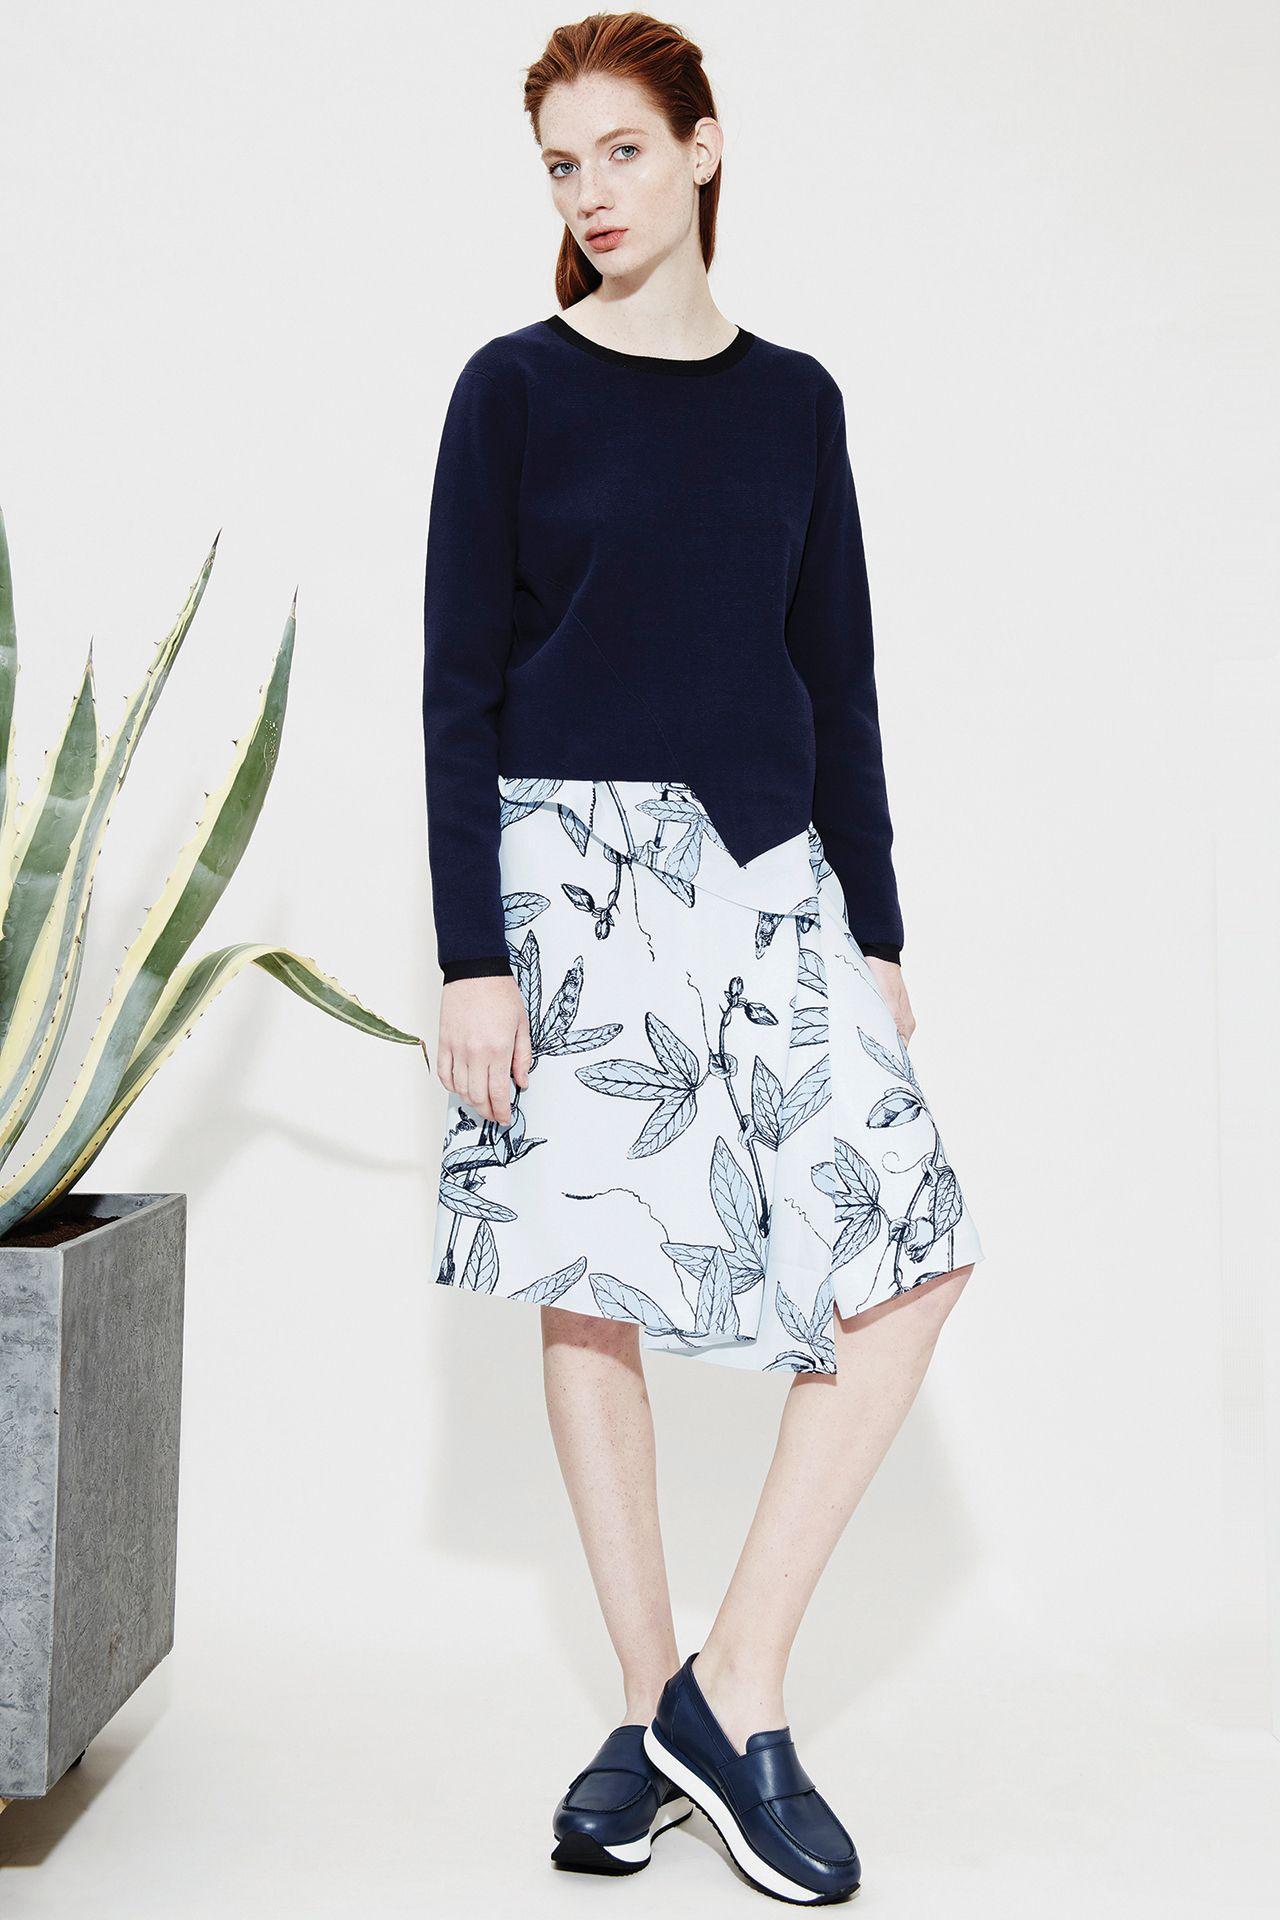 Look 11 - Mikki Asymmetric Knit | Romona Botanical Skirt | Daphne Loafer Flatforms